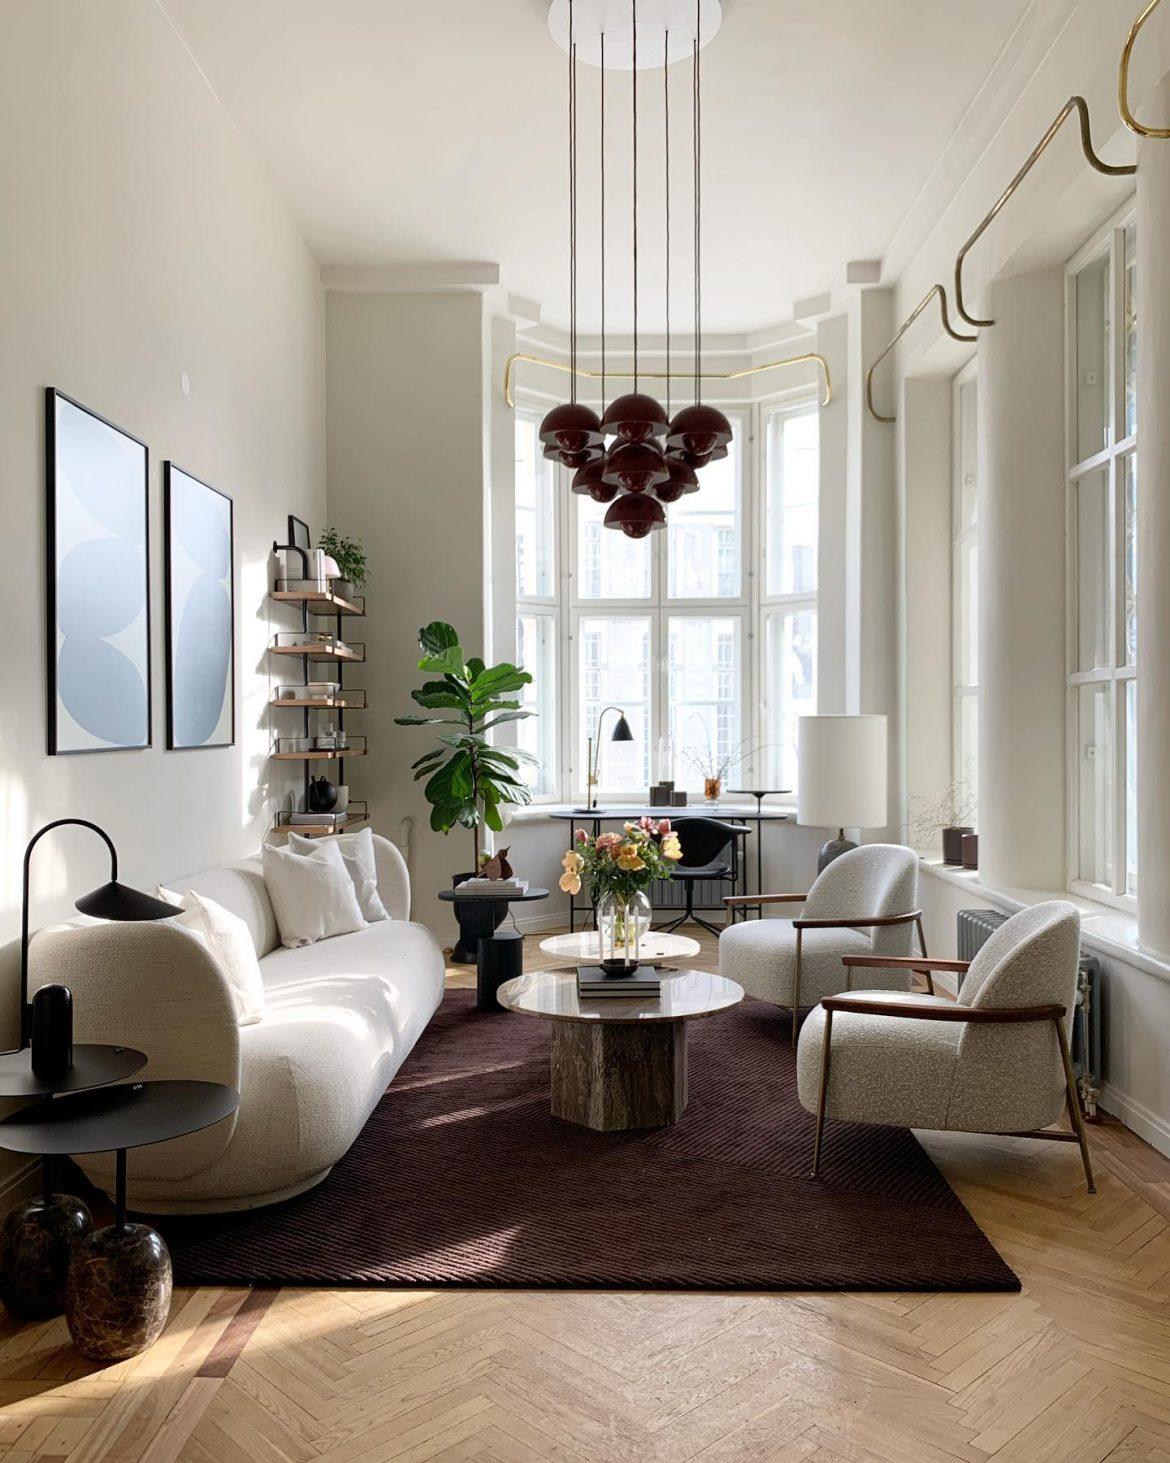 tallinn Tallinn: The Best Furniture Stores 3 3